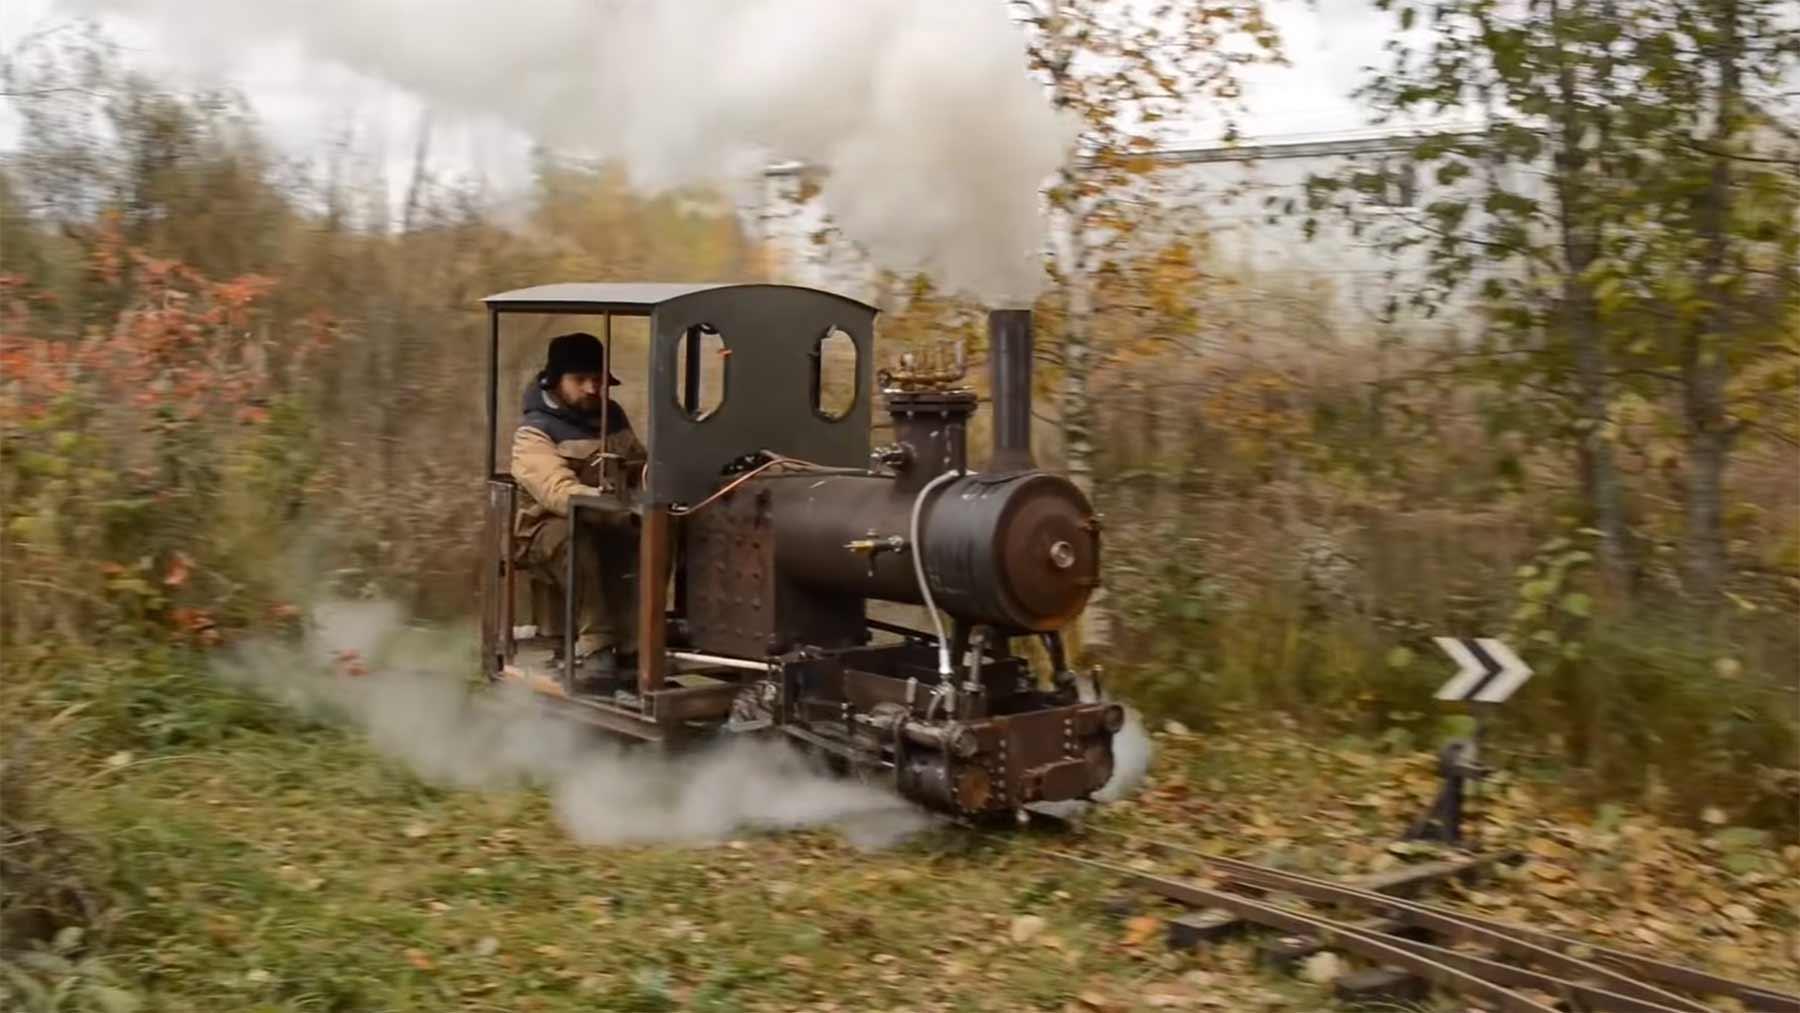 Russe baut eigene Mini-Dampflok im Garten